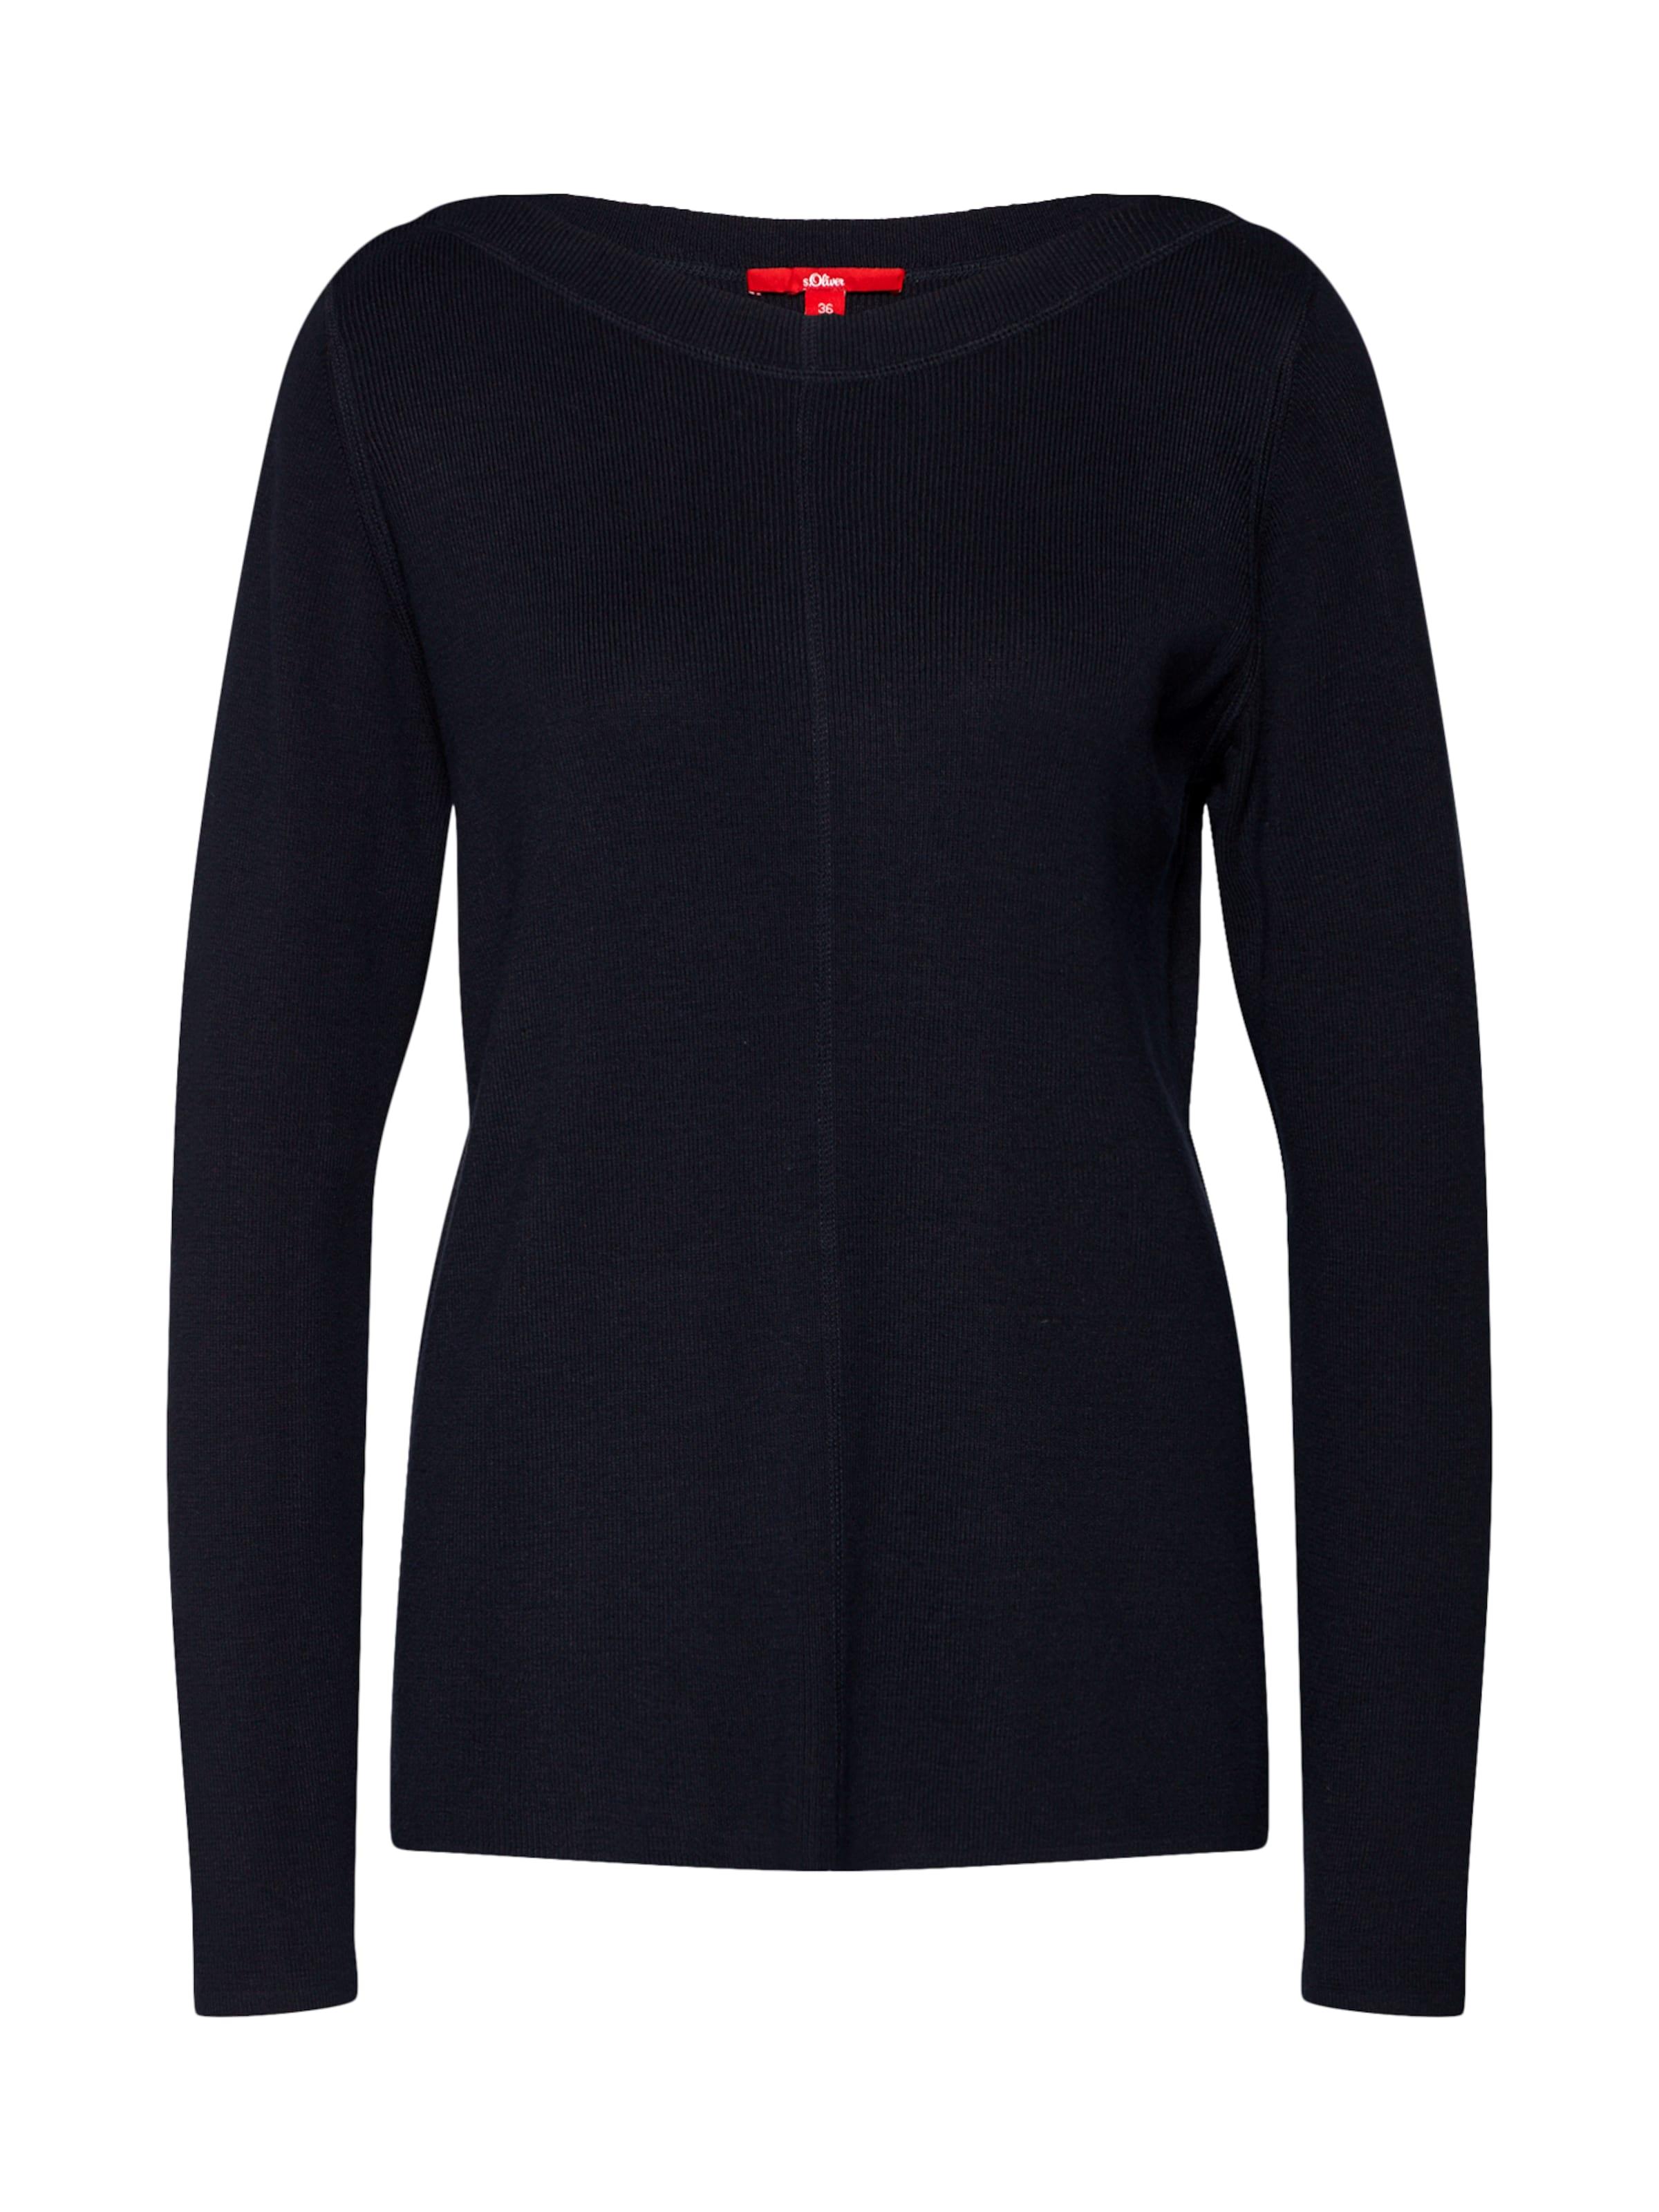 In Red oliver 'pullover Pullover S Langarm' Label Nachtblau 4LjAqRSc35